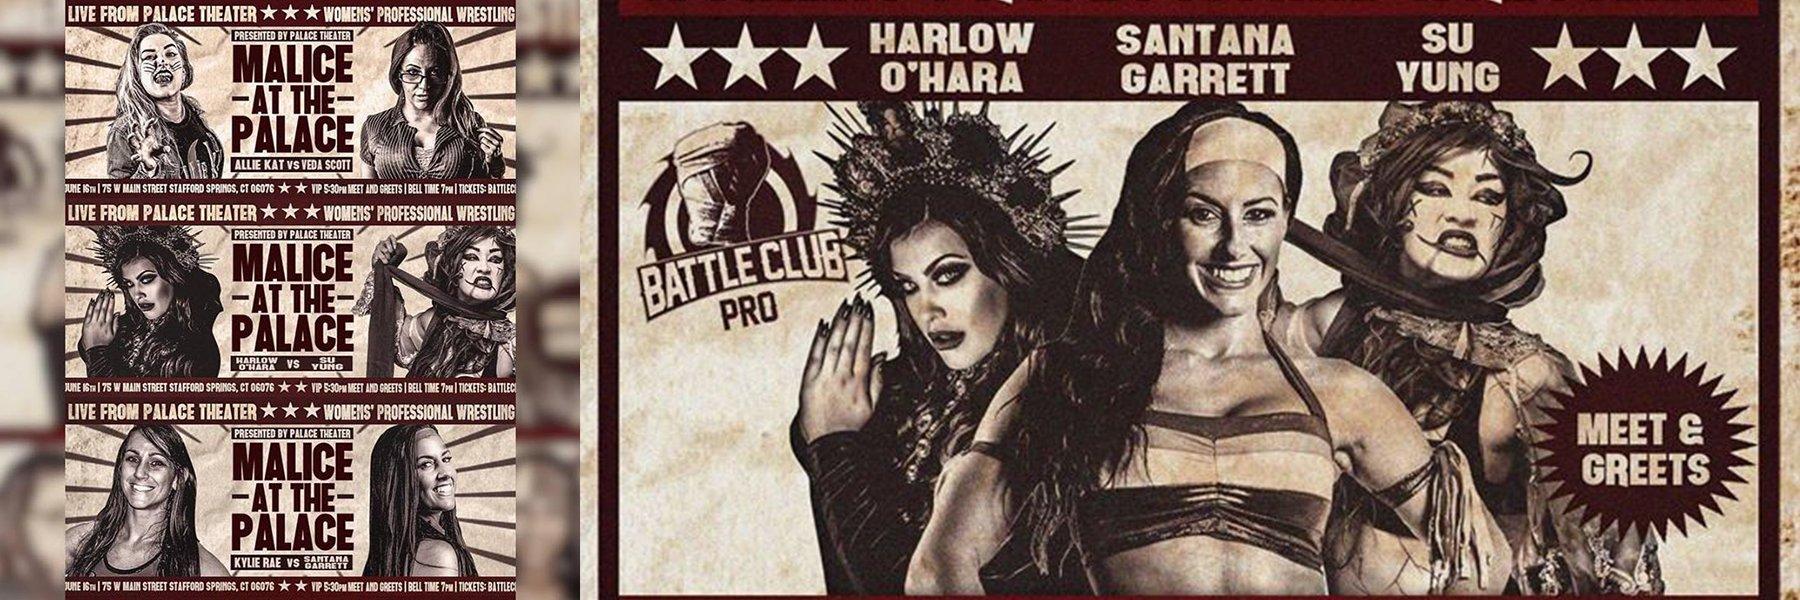 EXCLUSIVE: Battle Club Pro - Su Yung v O'Hara, Santana Garrett v Kylie Rae!